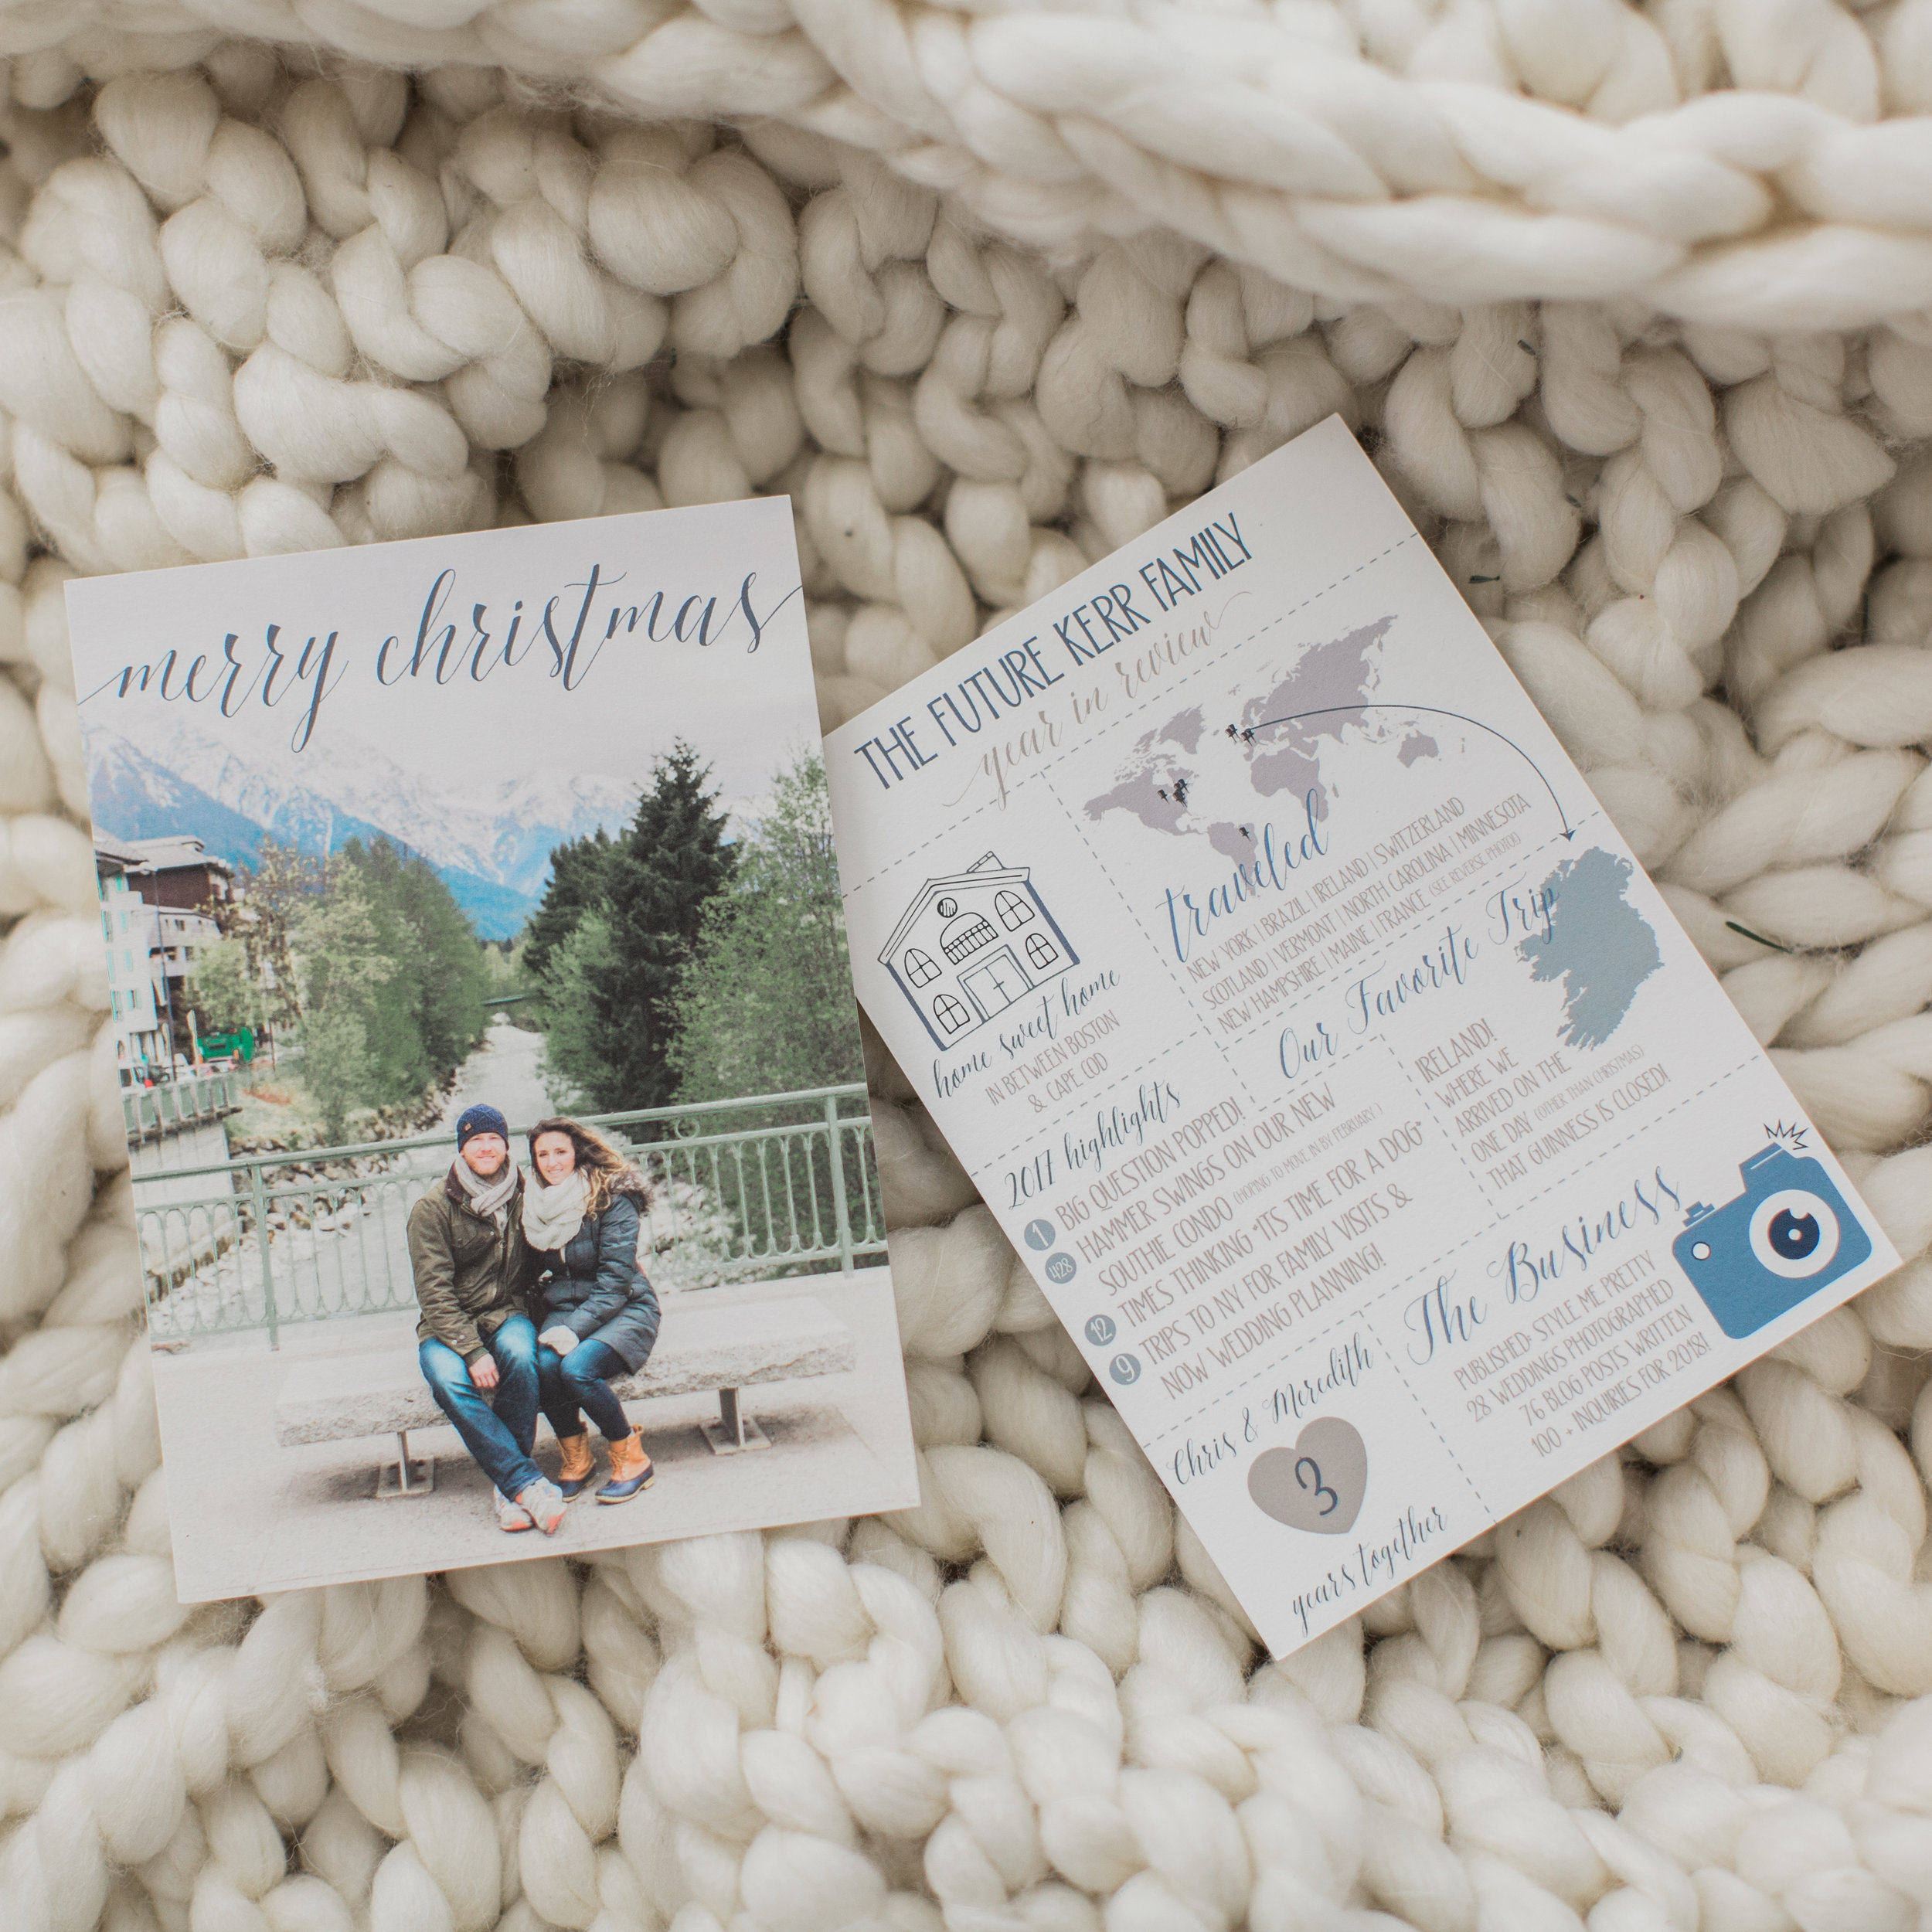 ChristmasCard-1.jpg